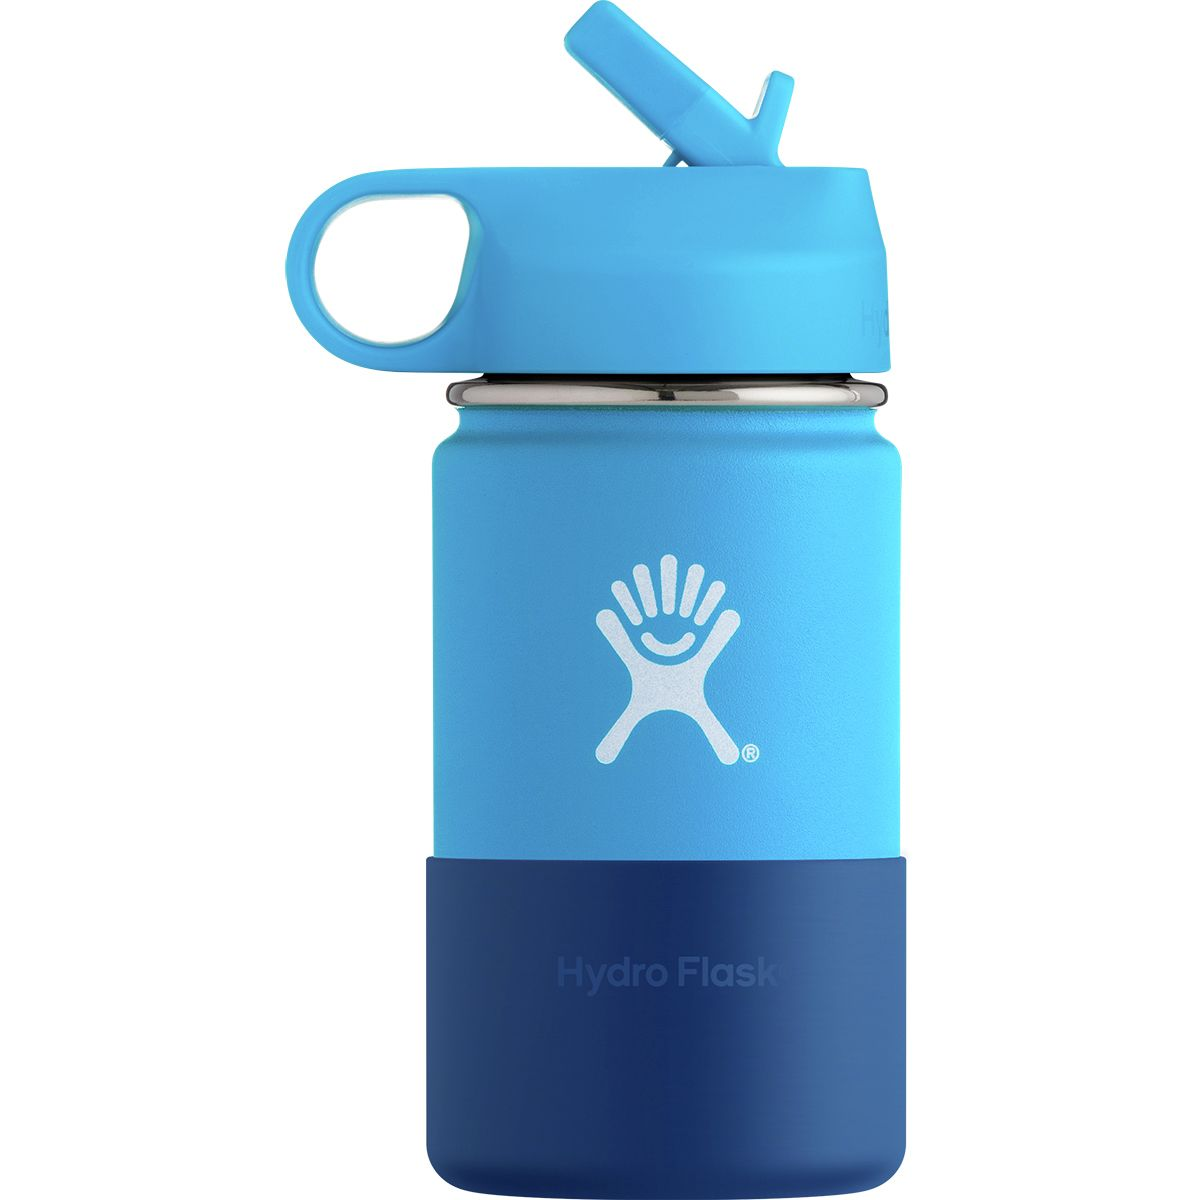 Hydro Flask 12 oz Kids Wide Mouth